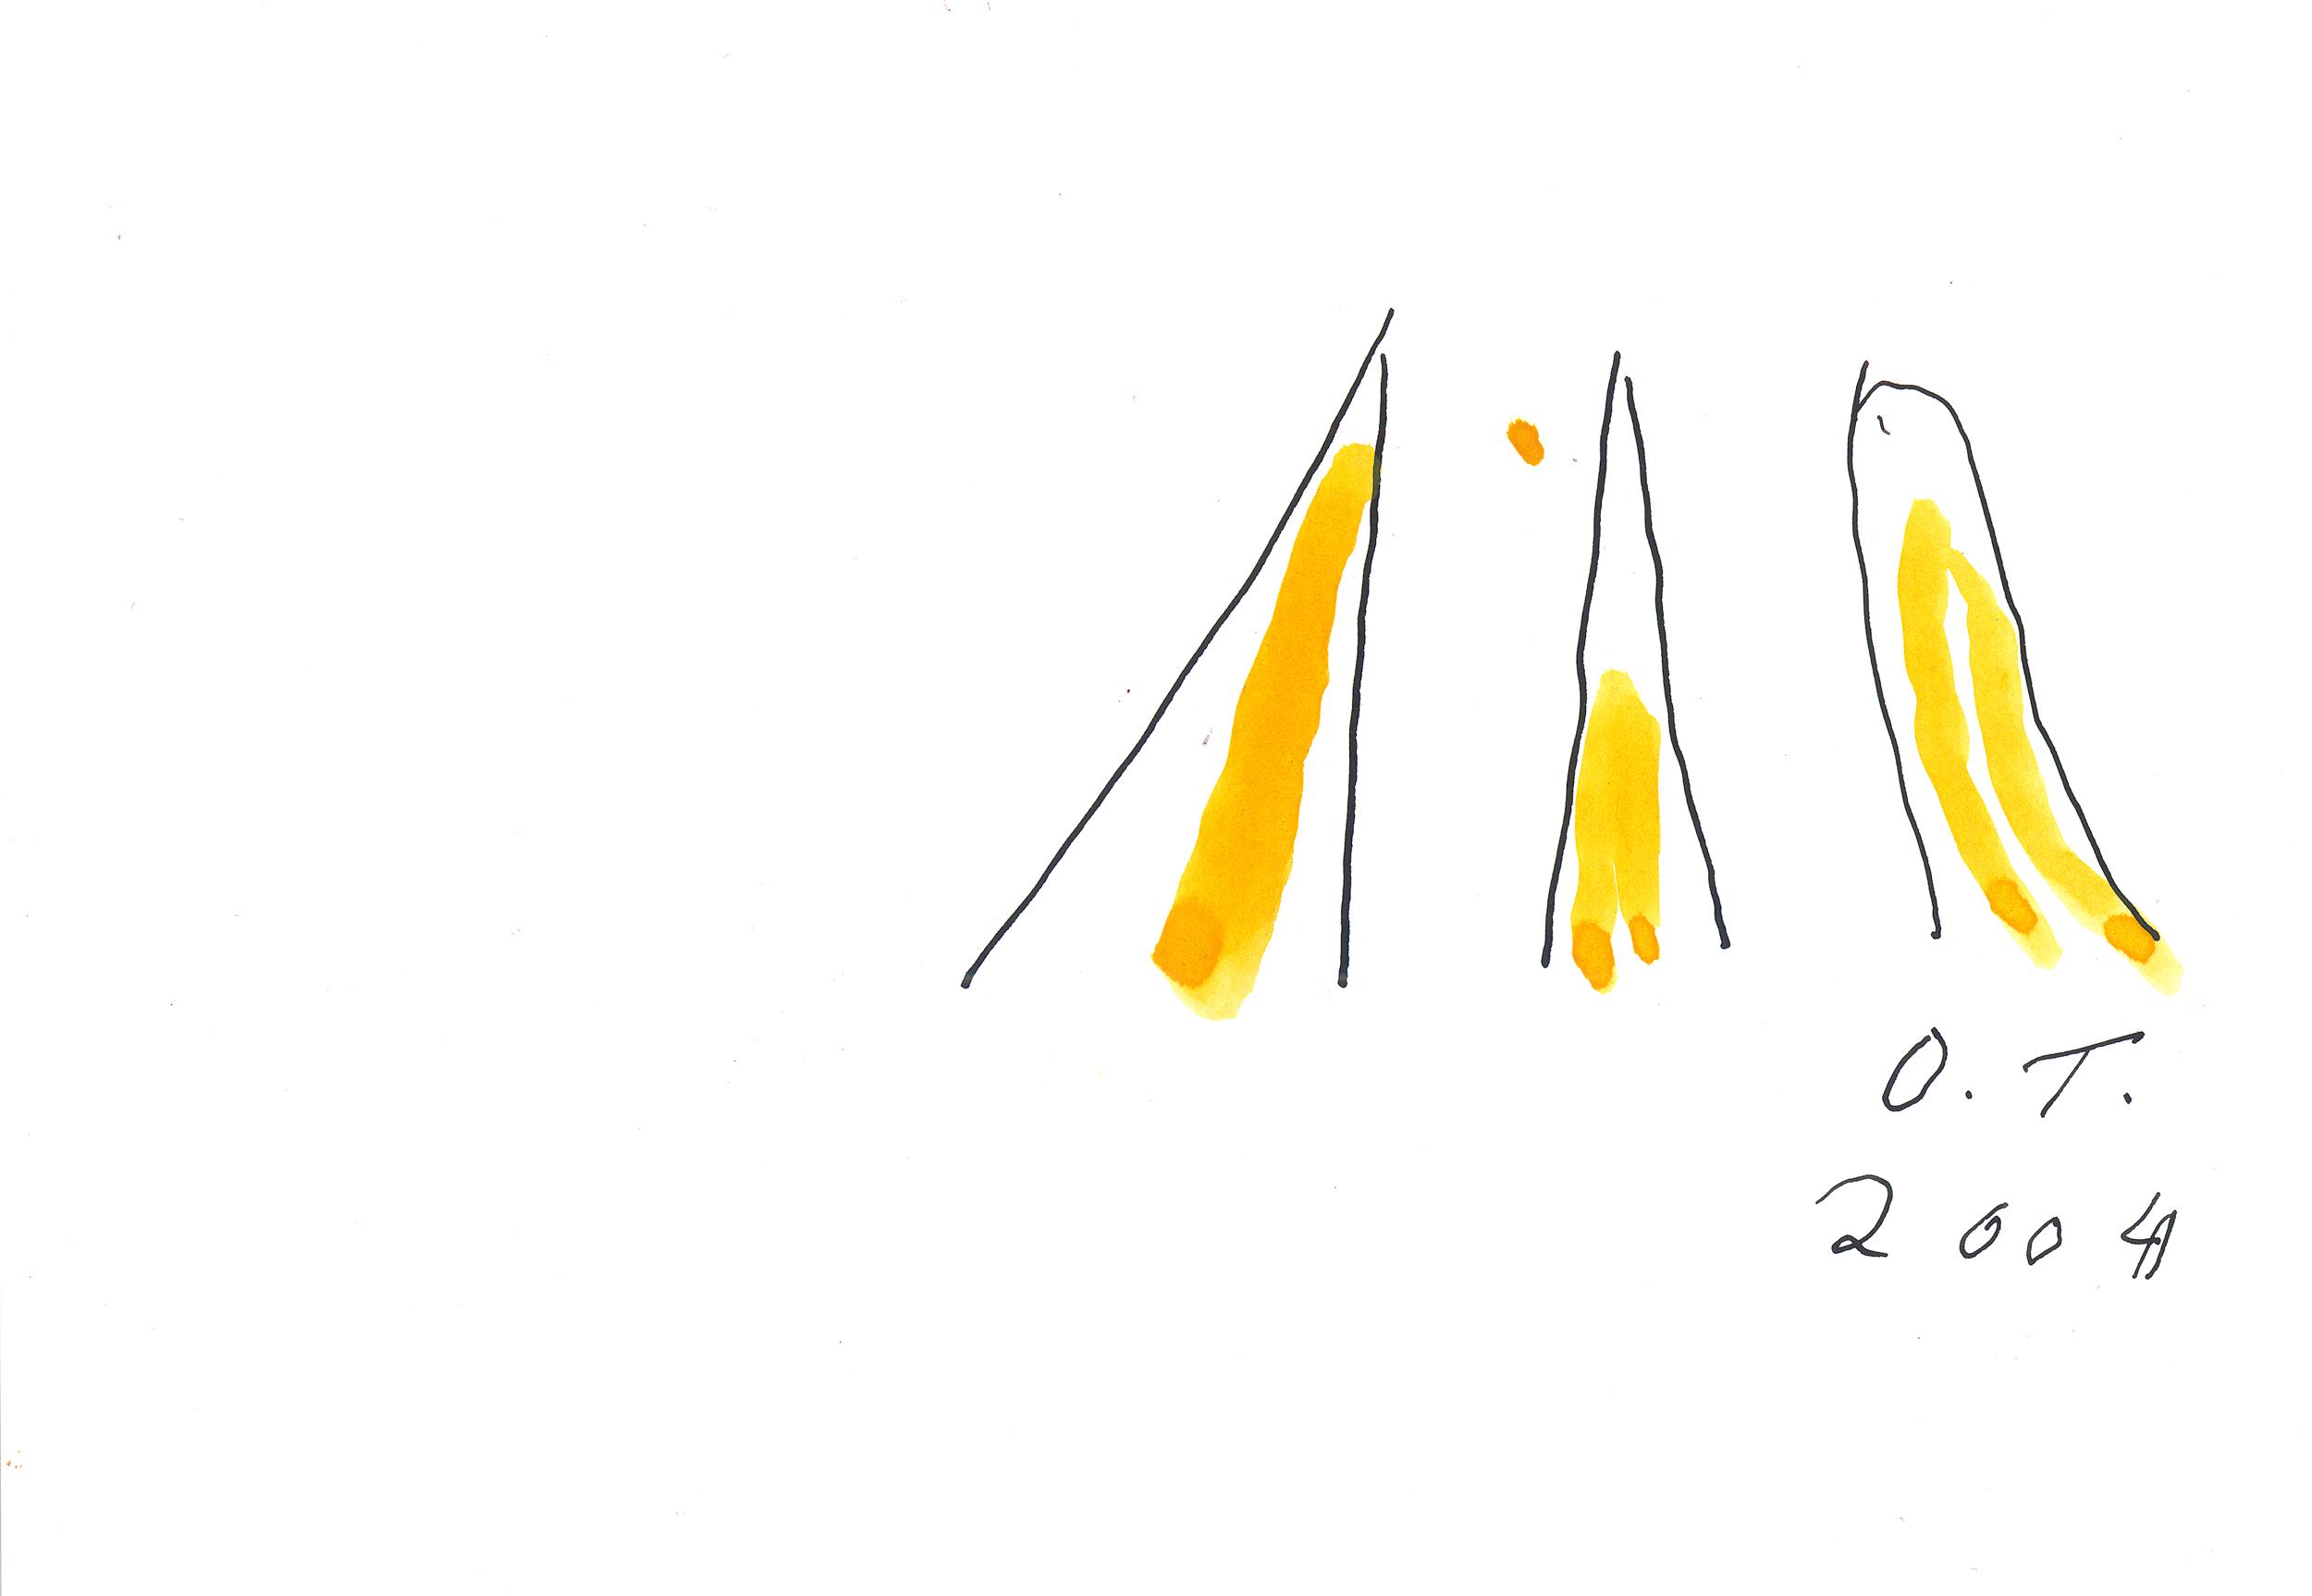 tschirtner oswald - Pyramiden / Pyramides